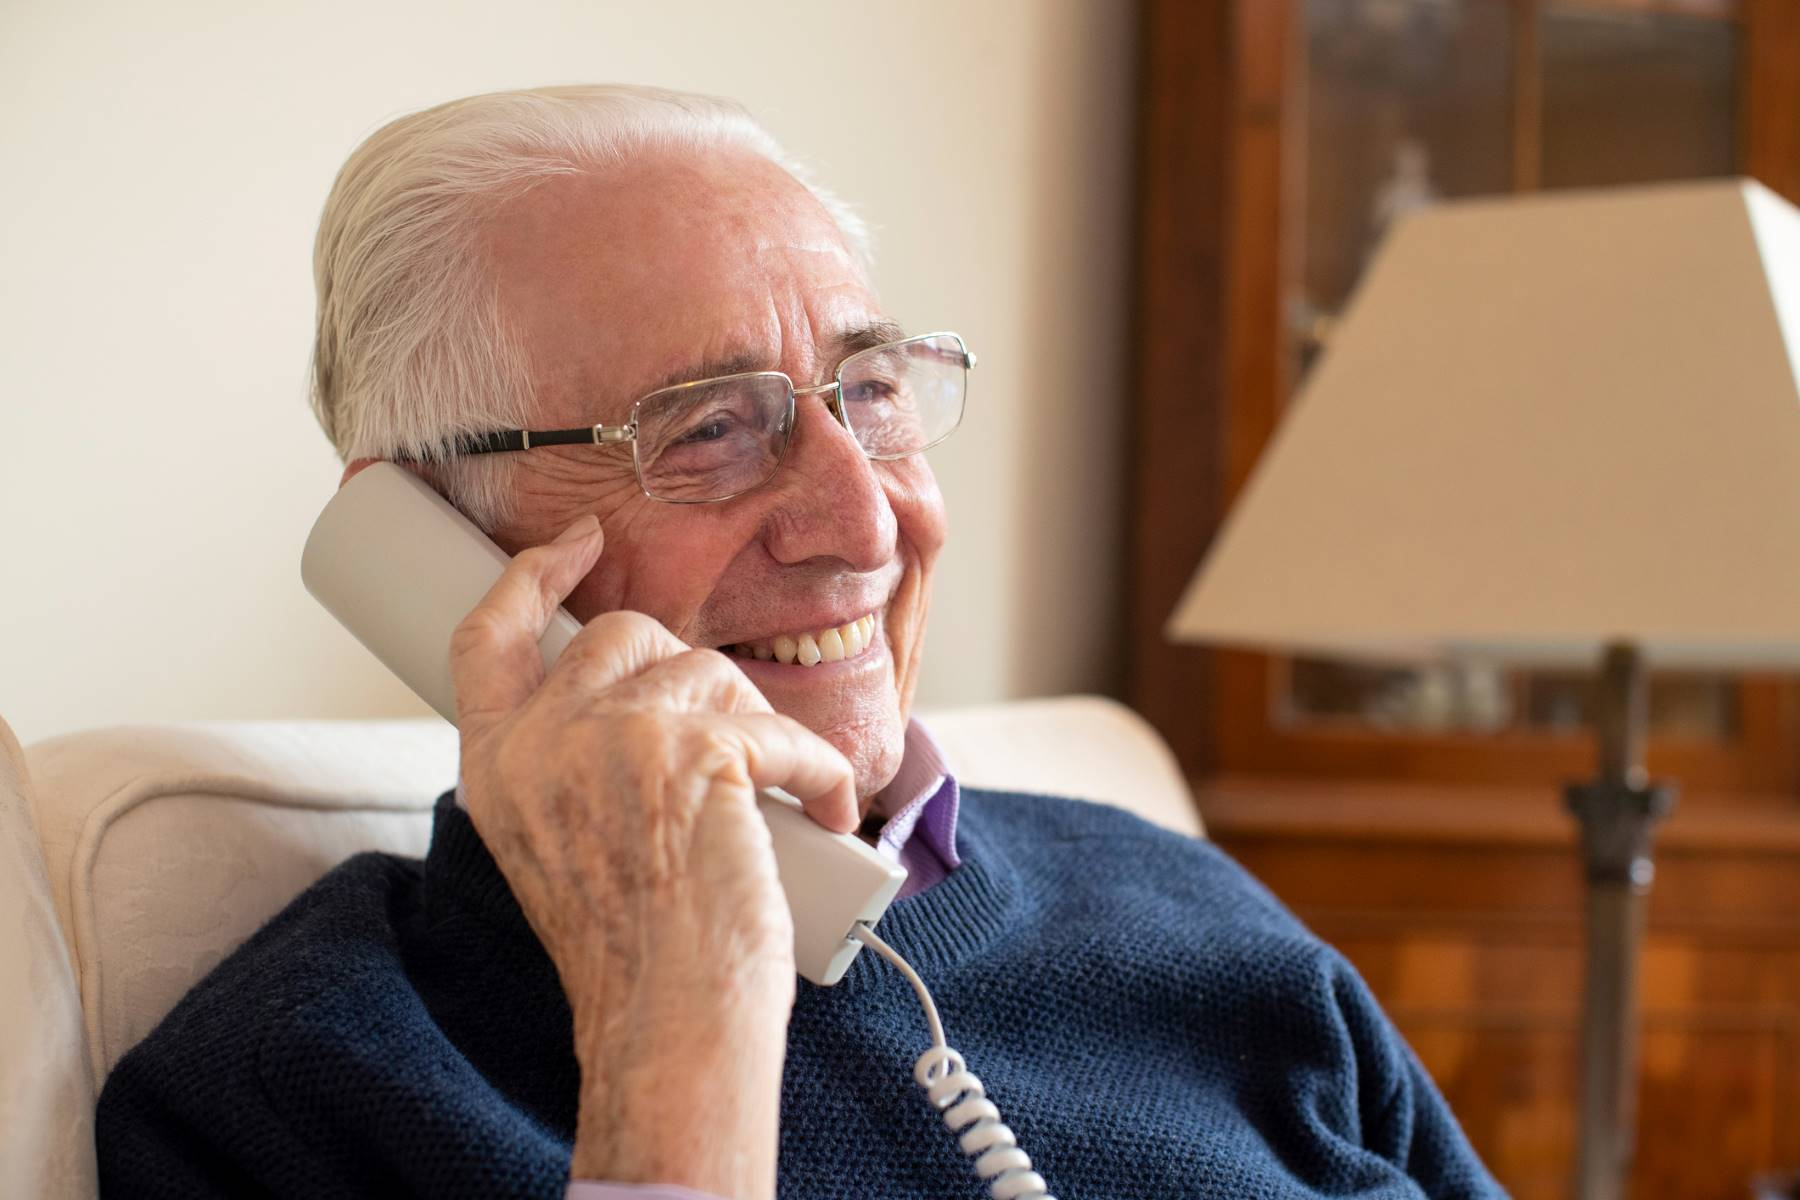 loneliness, community, telecare, elderly, mental-health